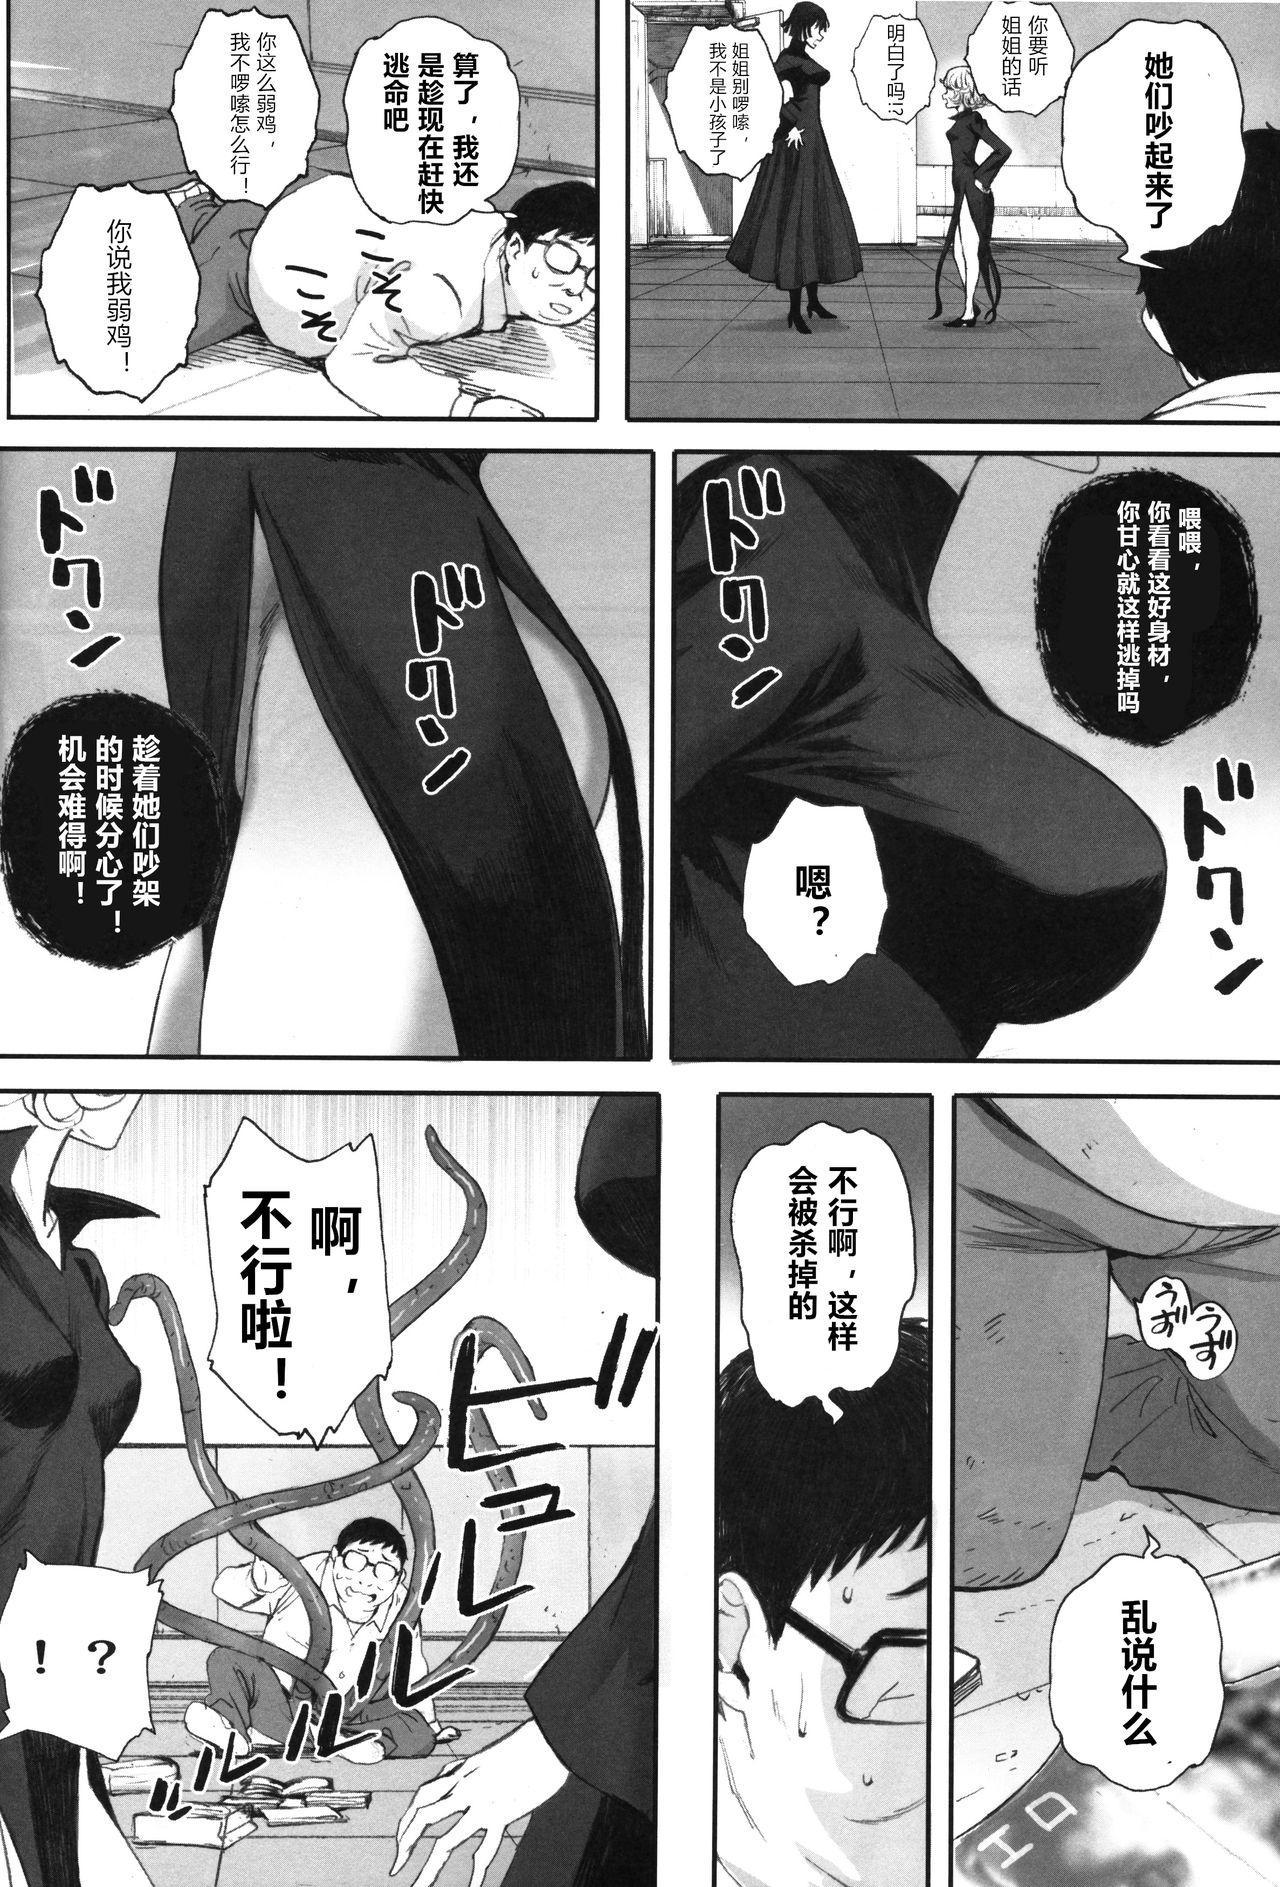 (C97) [Kansai Orange (Arai Kei)] Ichigeki Haiboku (One Punch Man)(chinese) 4